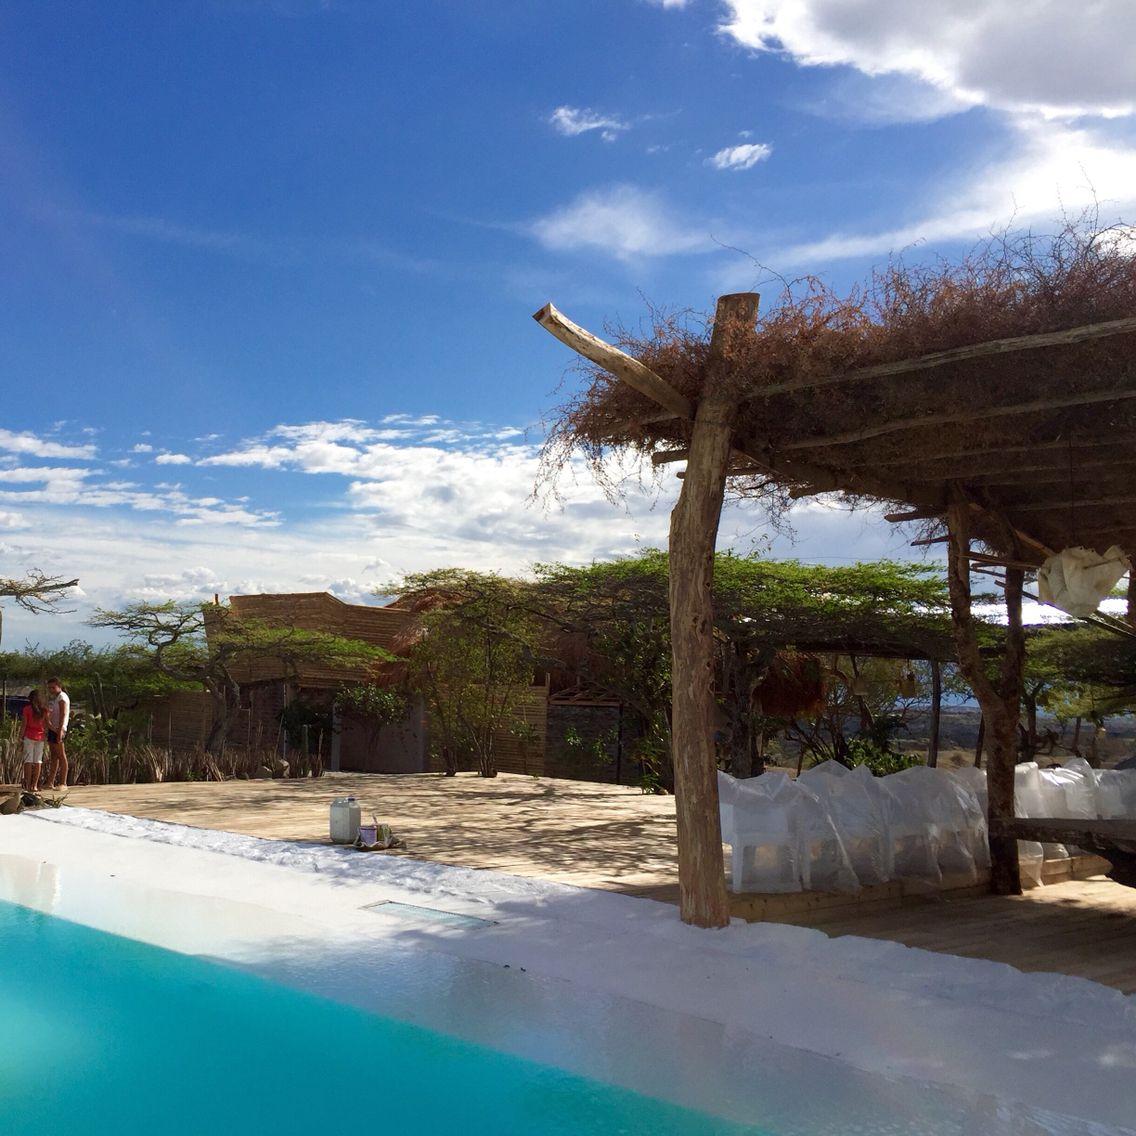 Piscina bethel bio luxury hotel piscina outdoor decor for Bio piscina